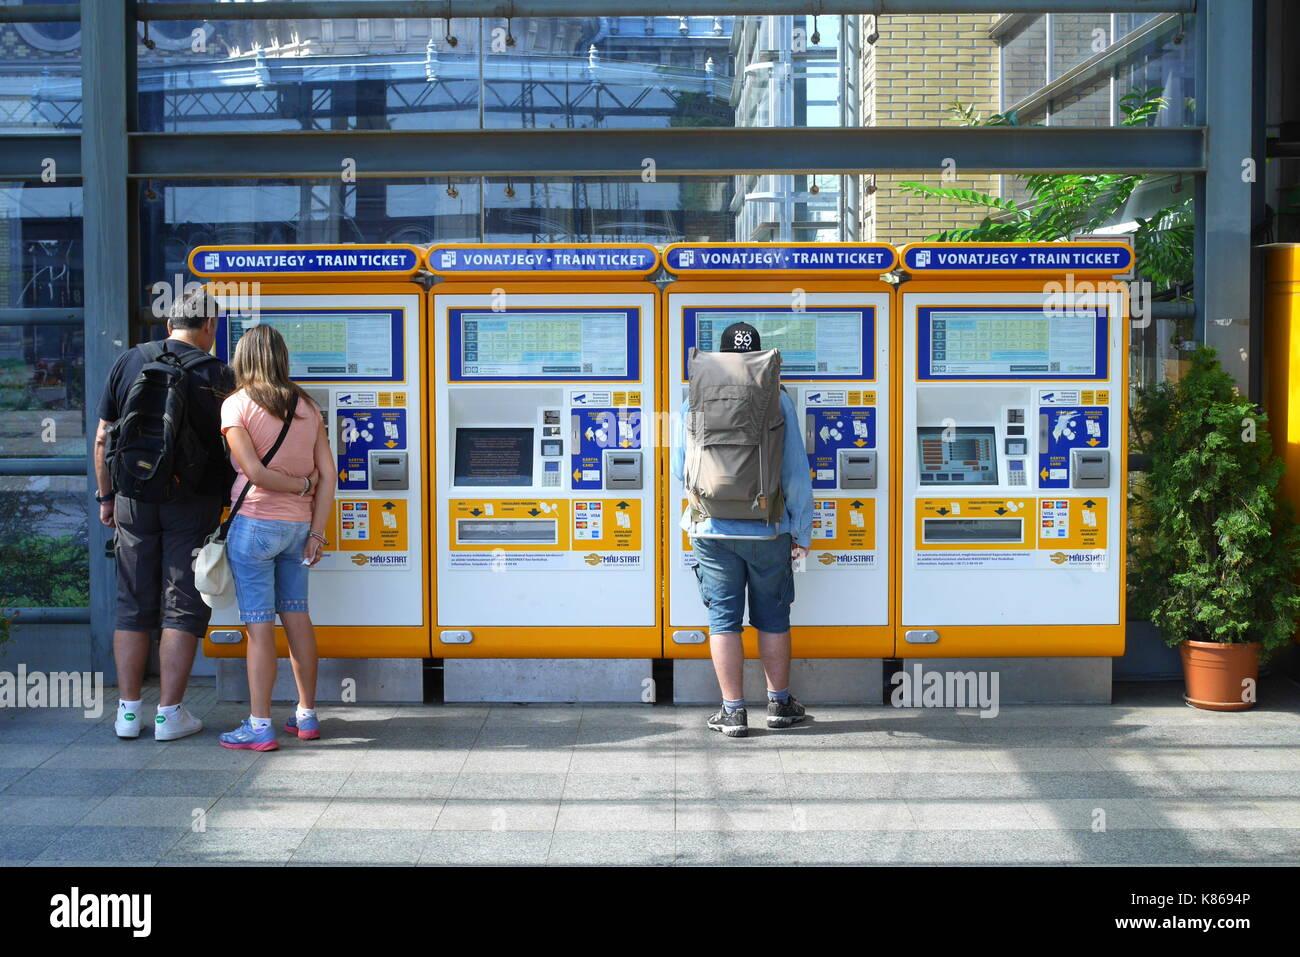 Passengers buying train tickets from self-service ticket machines, Nyugati Palyaudvar, Budapest, Hungary Stock Photo